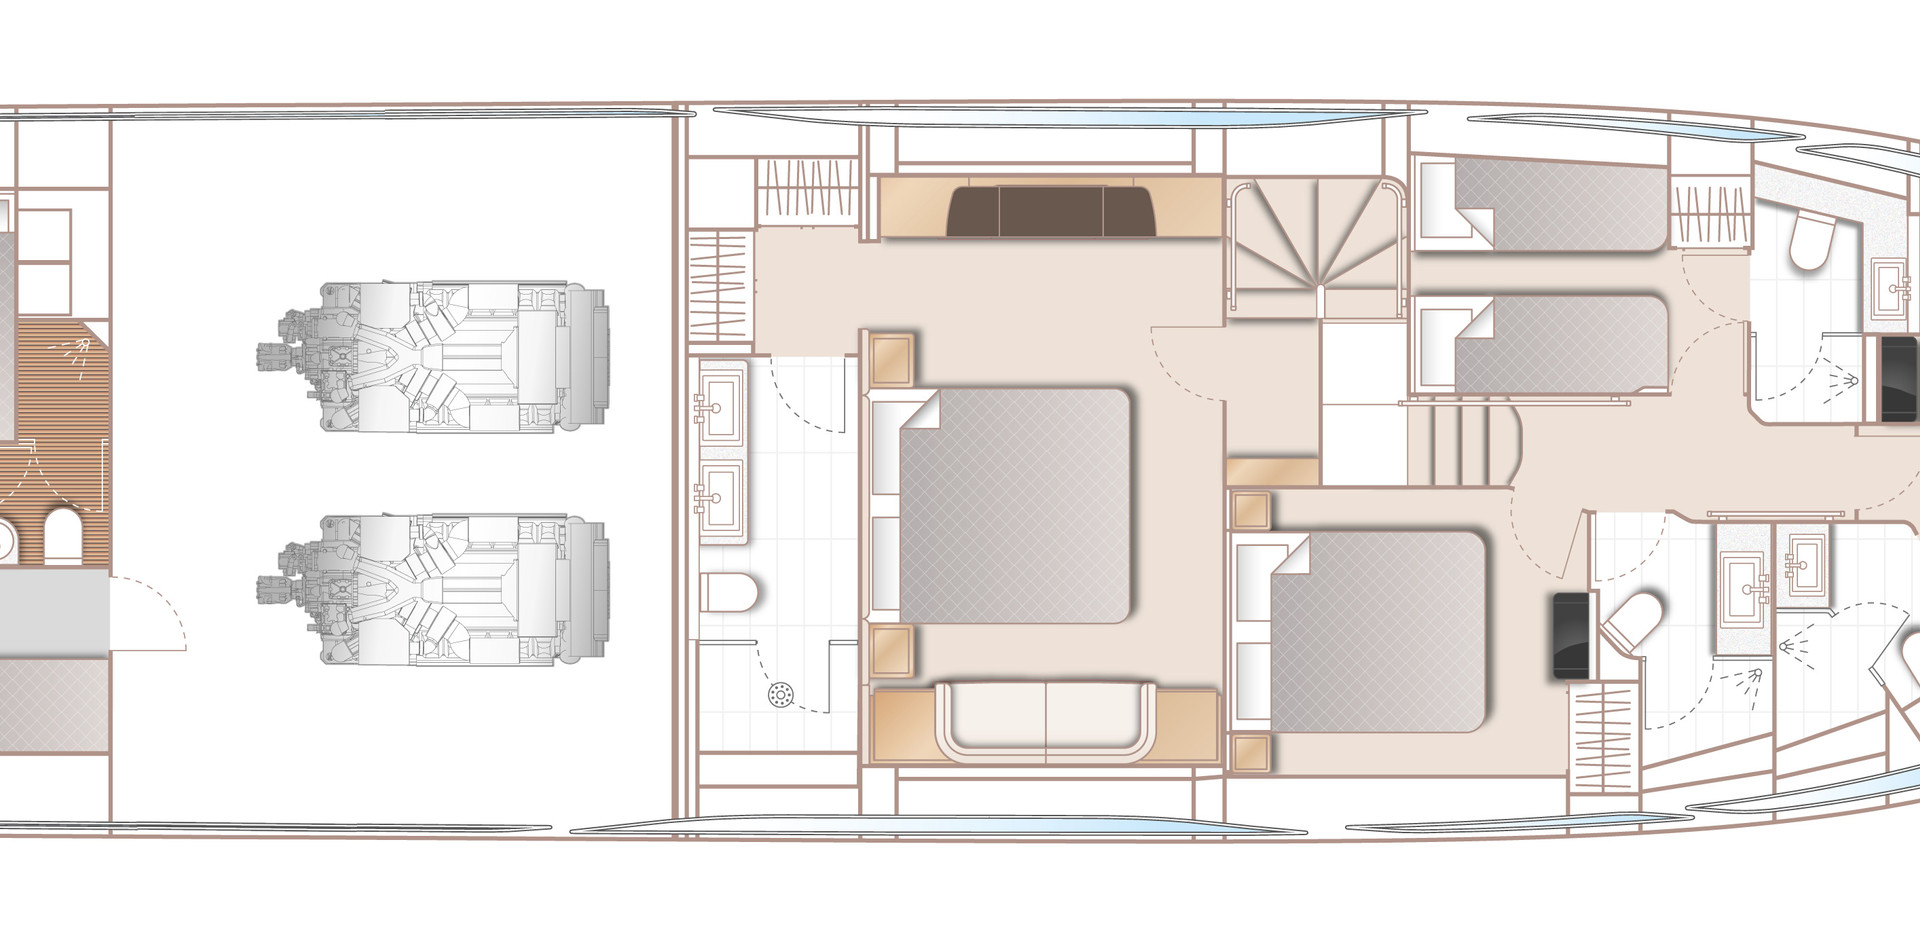 y78-layout-lower-deck.jpg